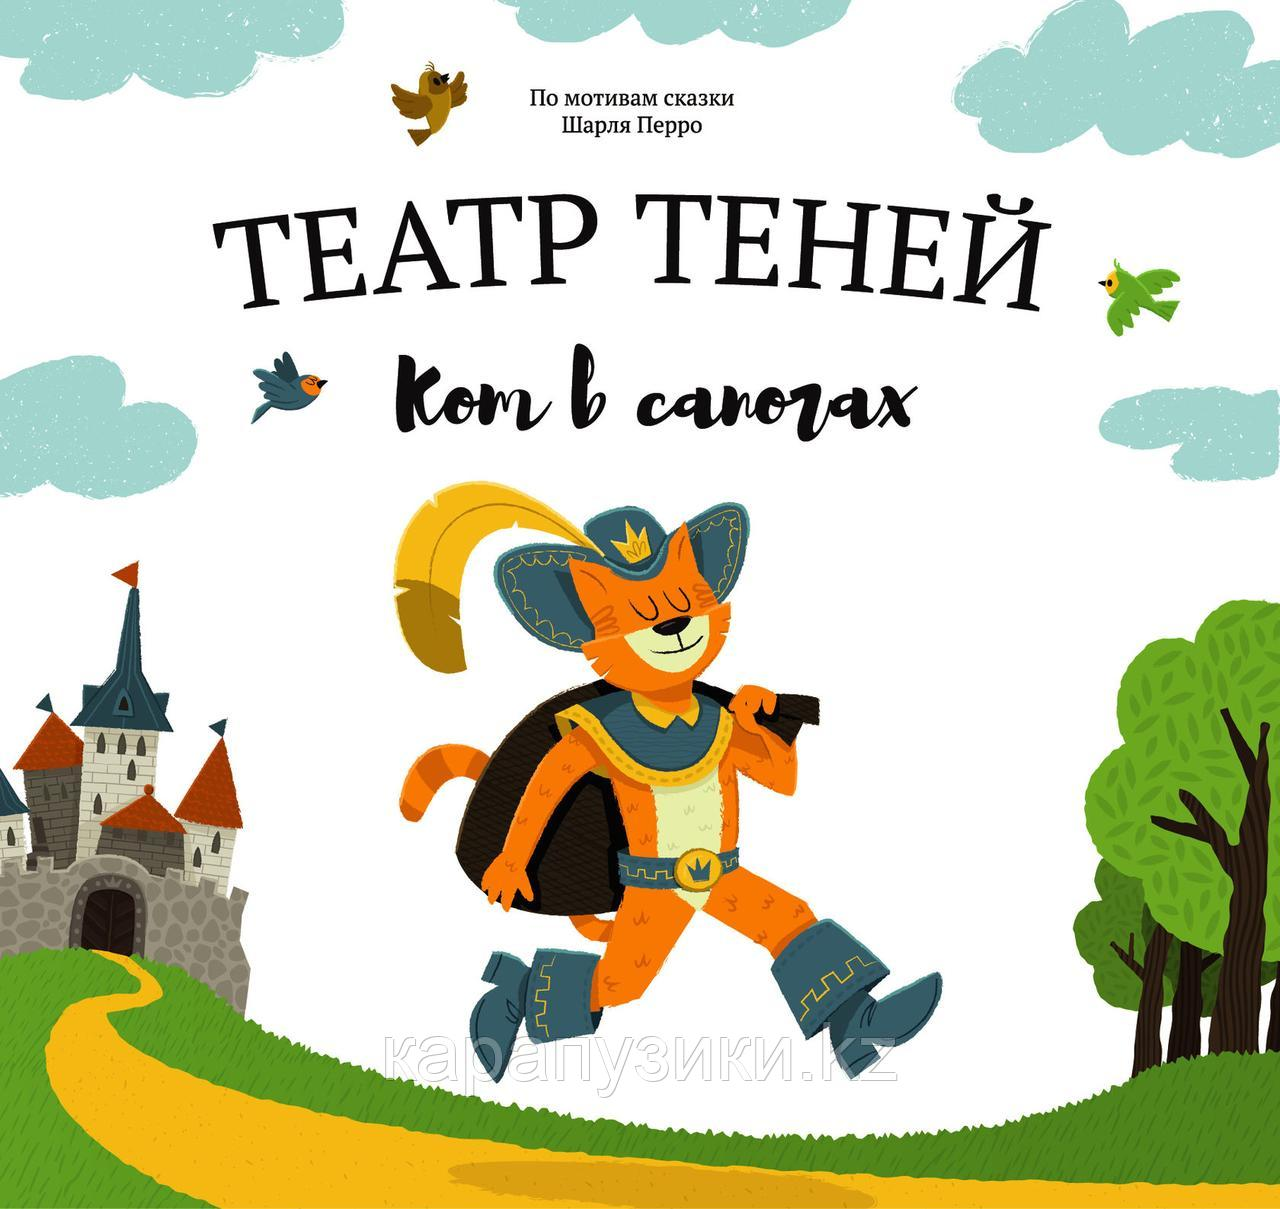 Книга театр теней Кот в сапогах